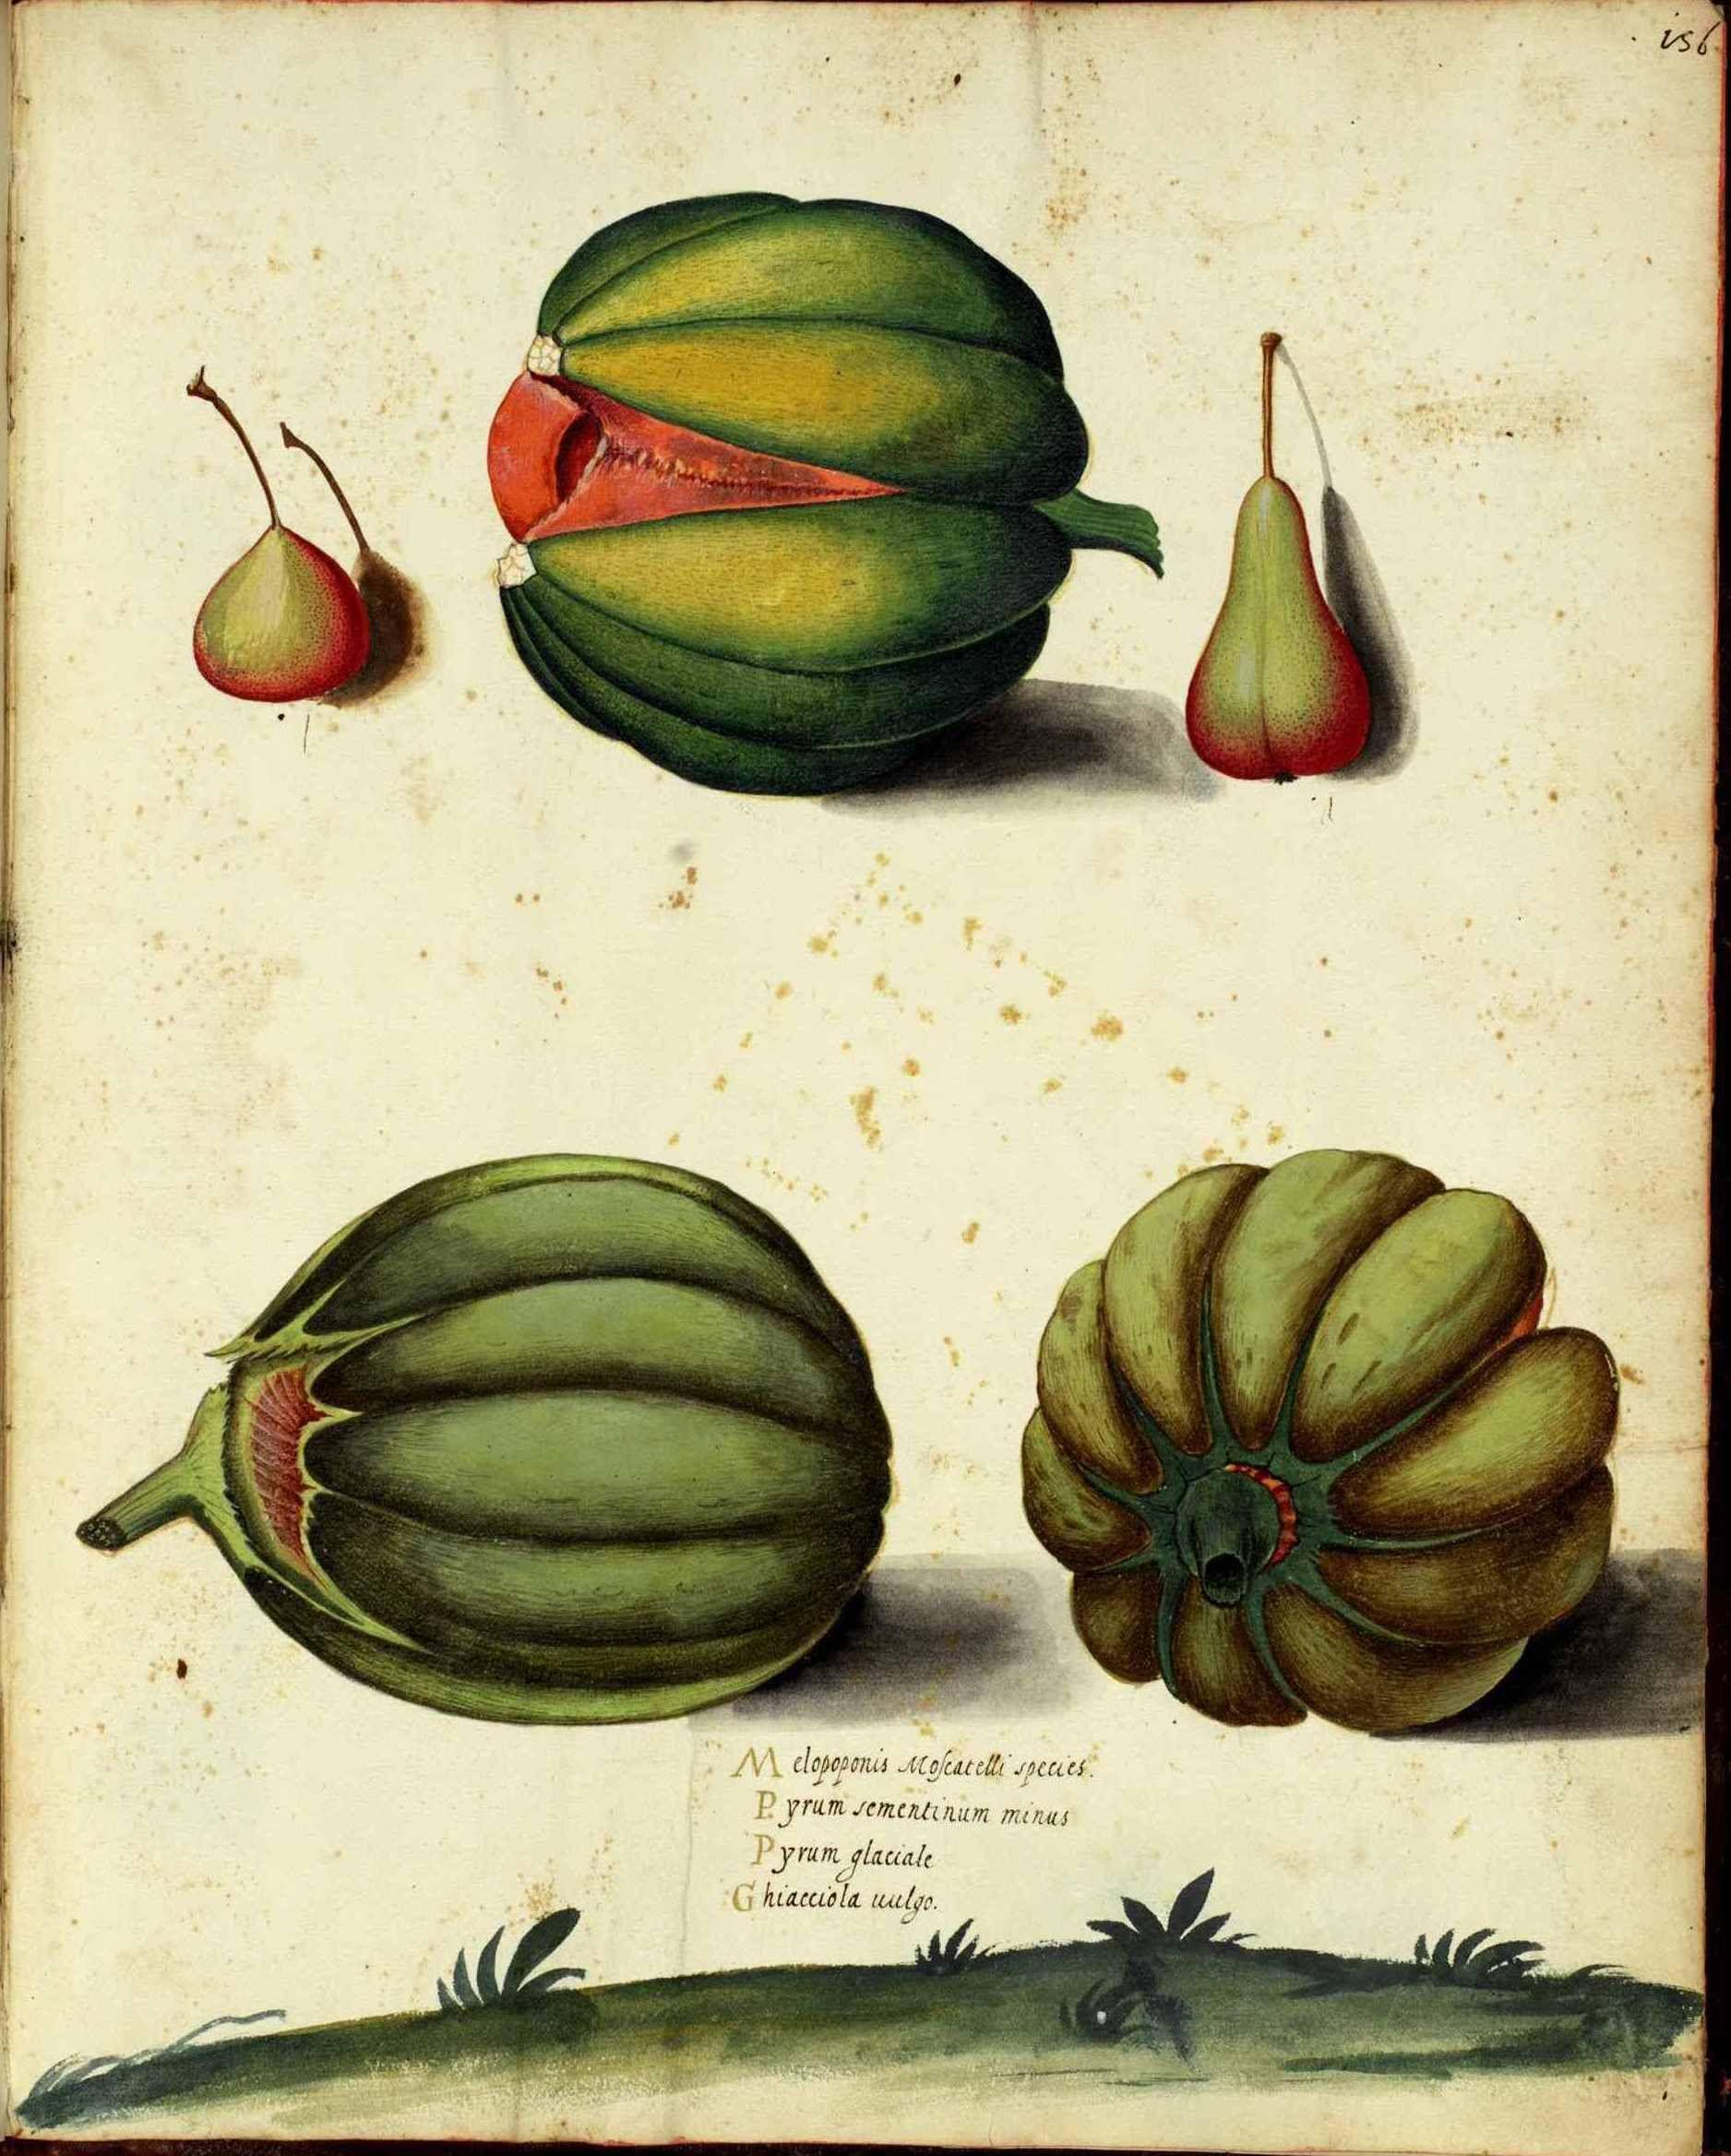 http://vintageprintable.com/wordpress/wp-content/uploads/2010/08/Botanical-Melon-Italian-3.jpg